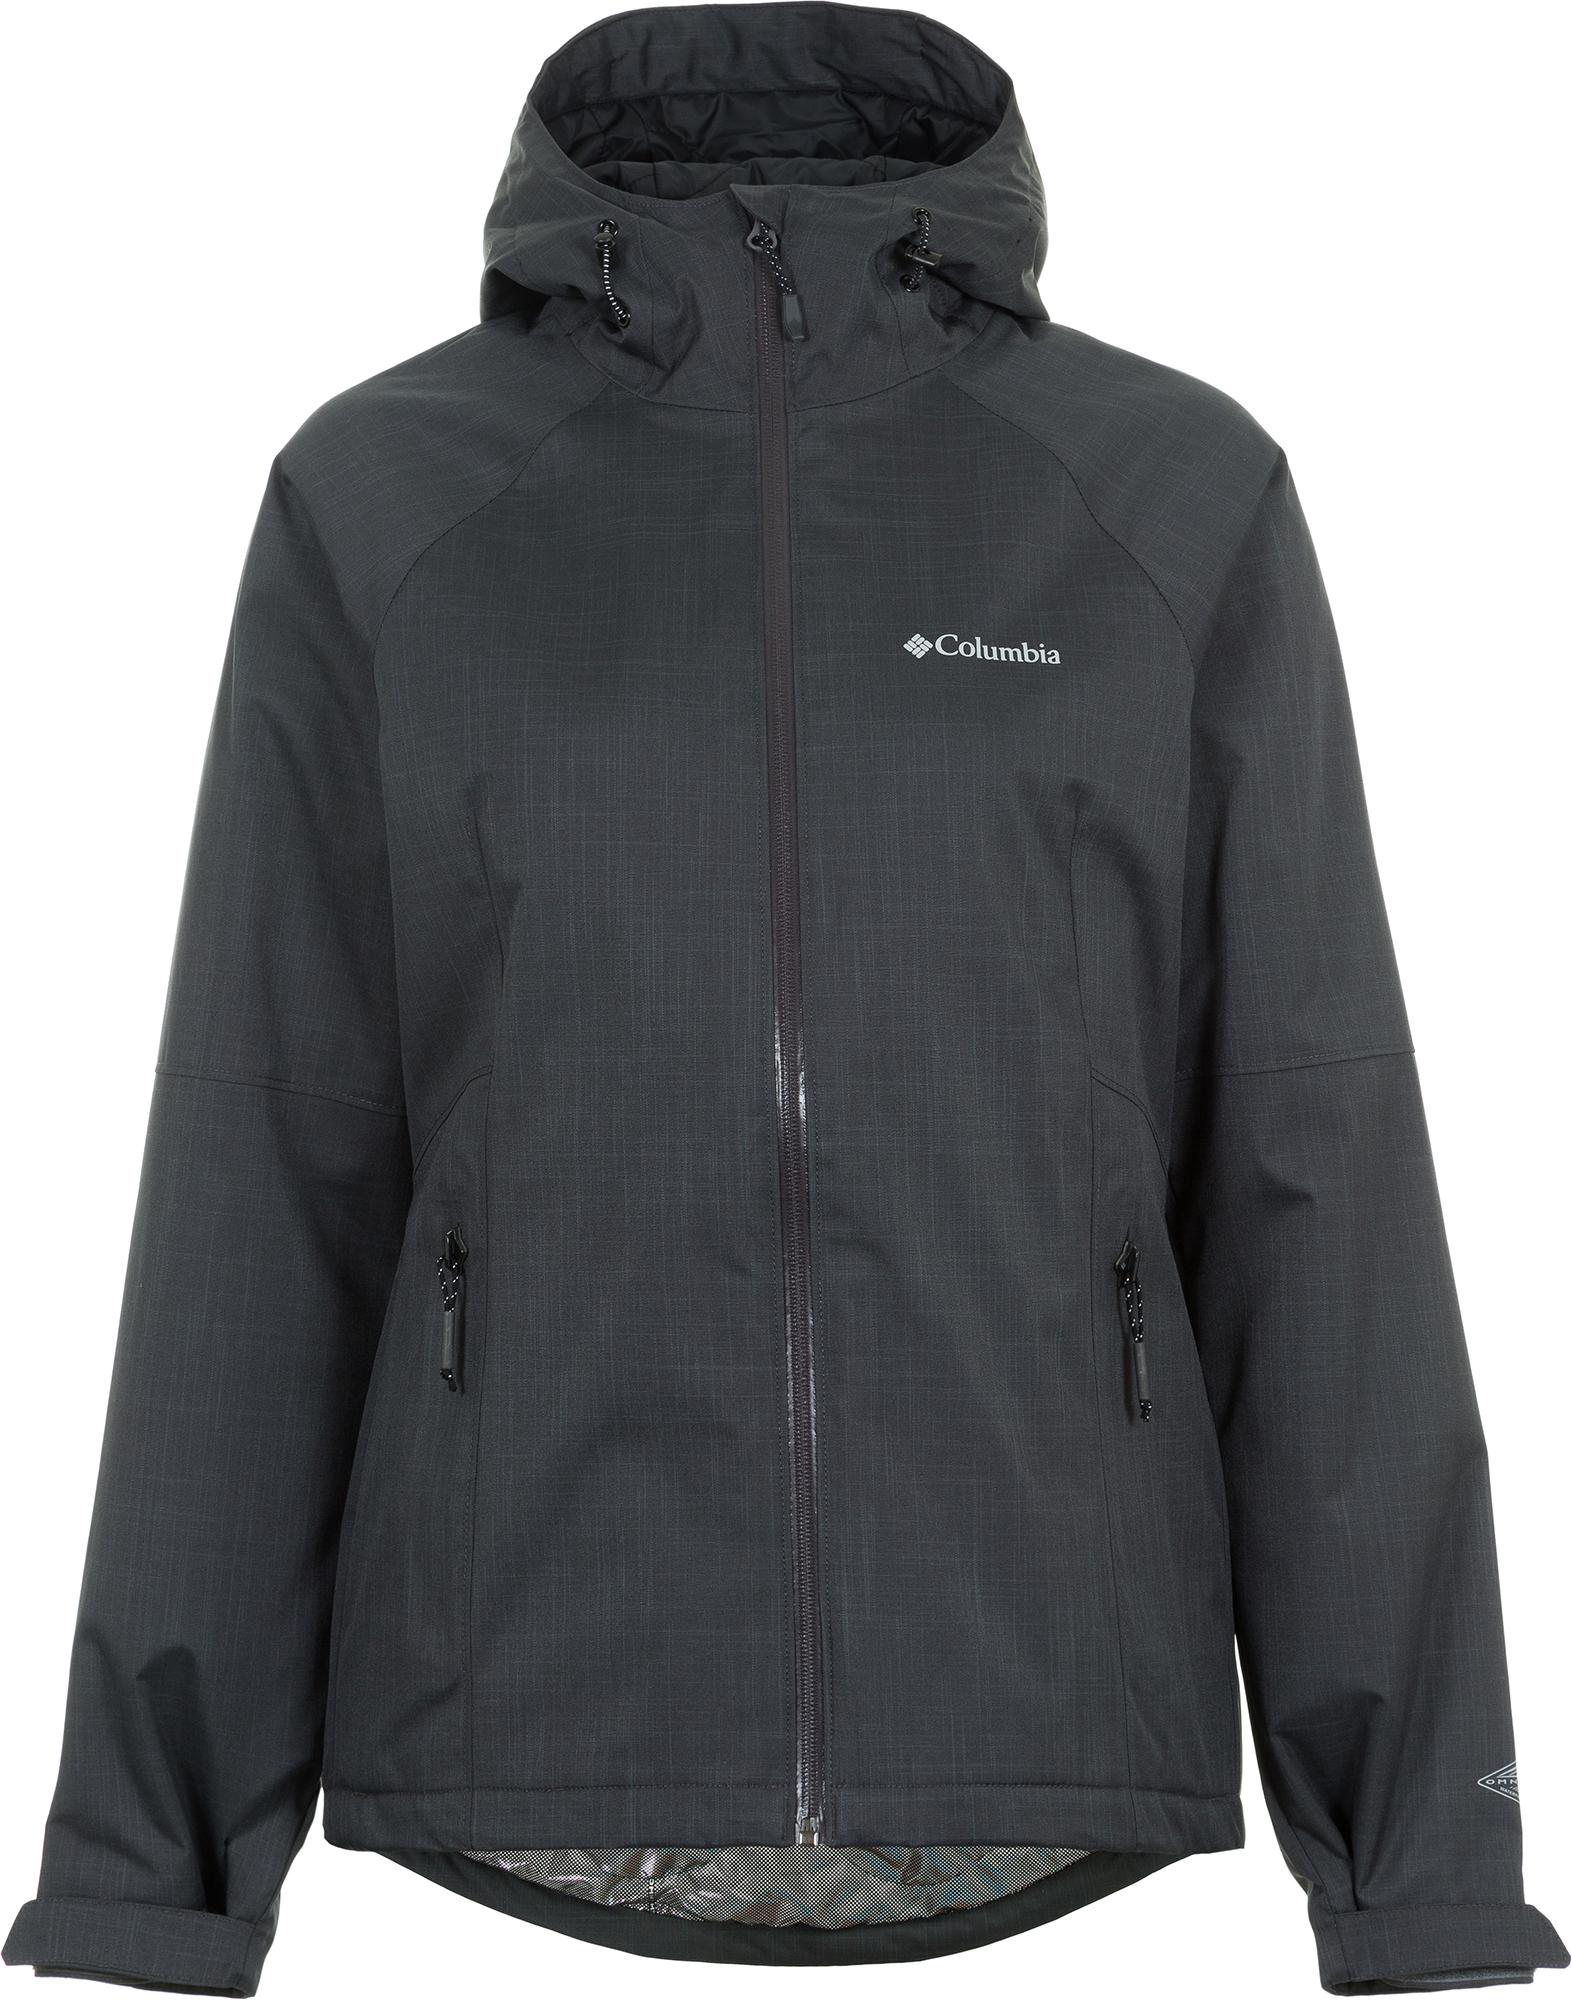 Columbia Куртка утепленная женская Columbia Sprague Mountain, размер 50